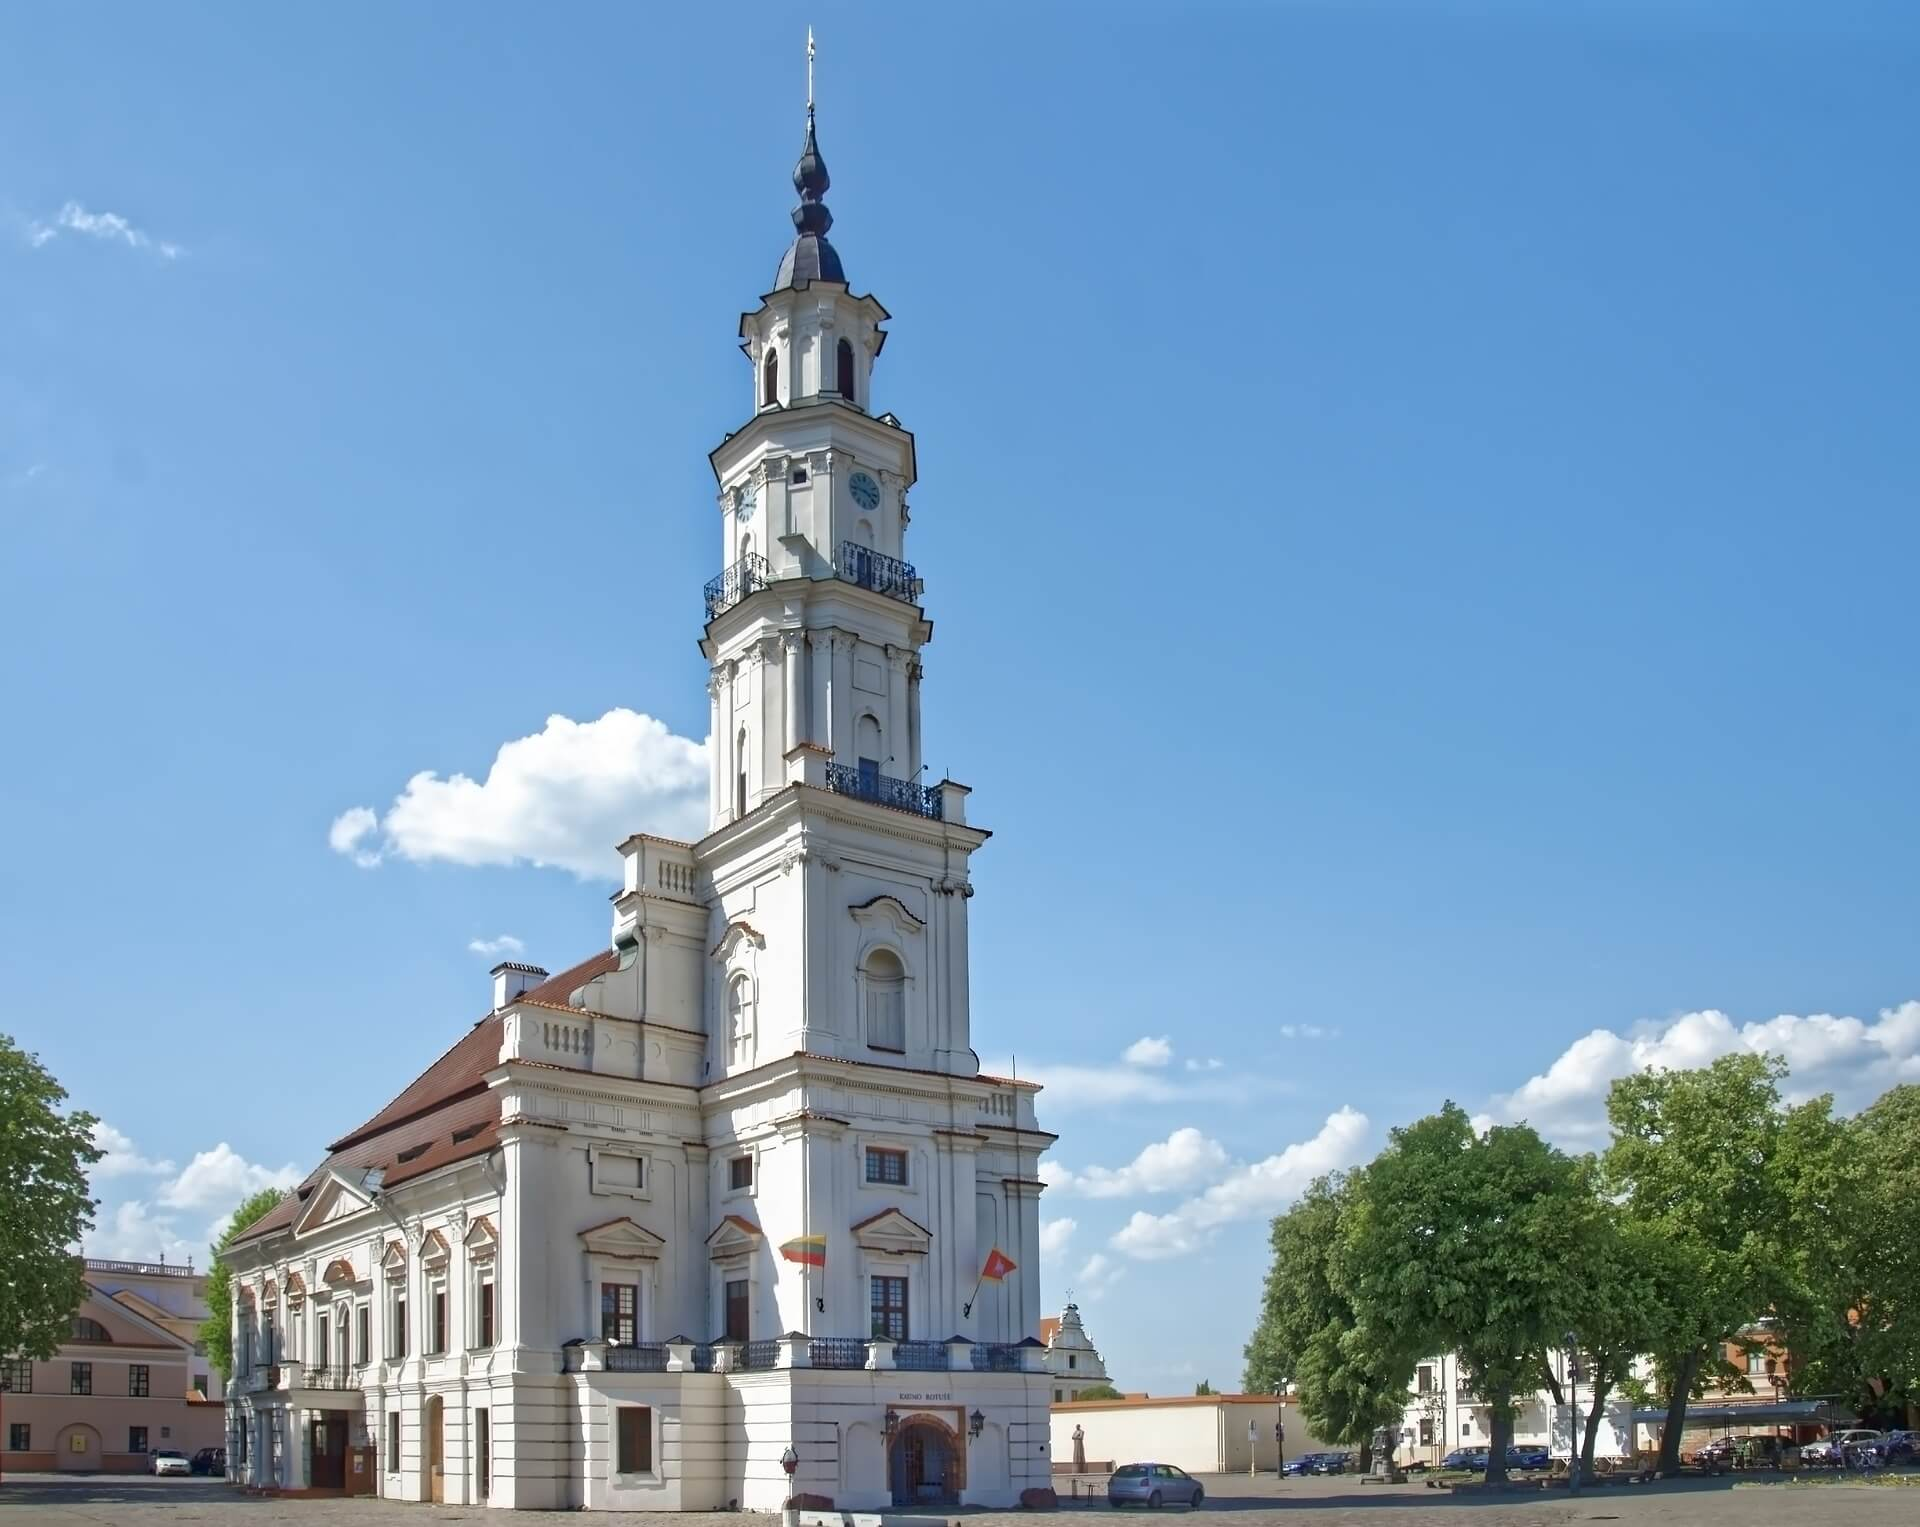 Rental Car in Kaunas 2